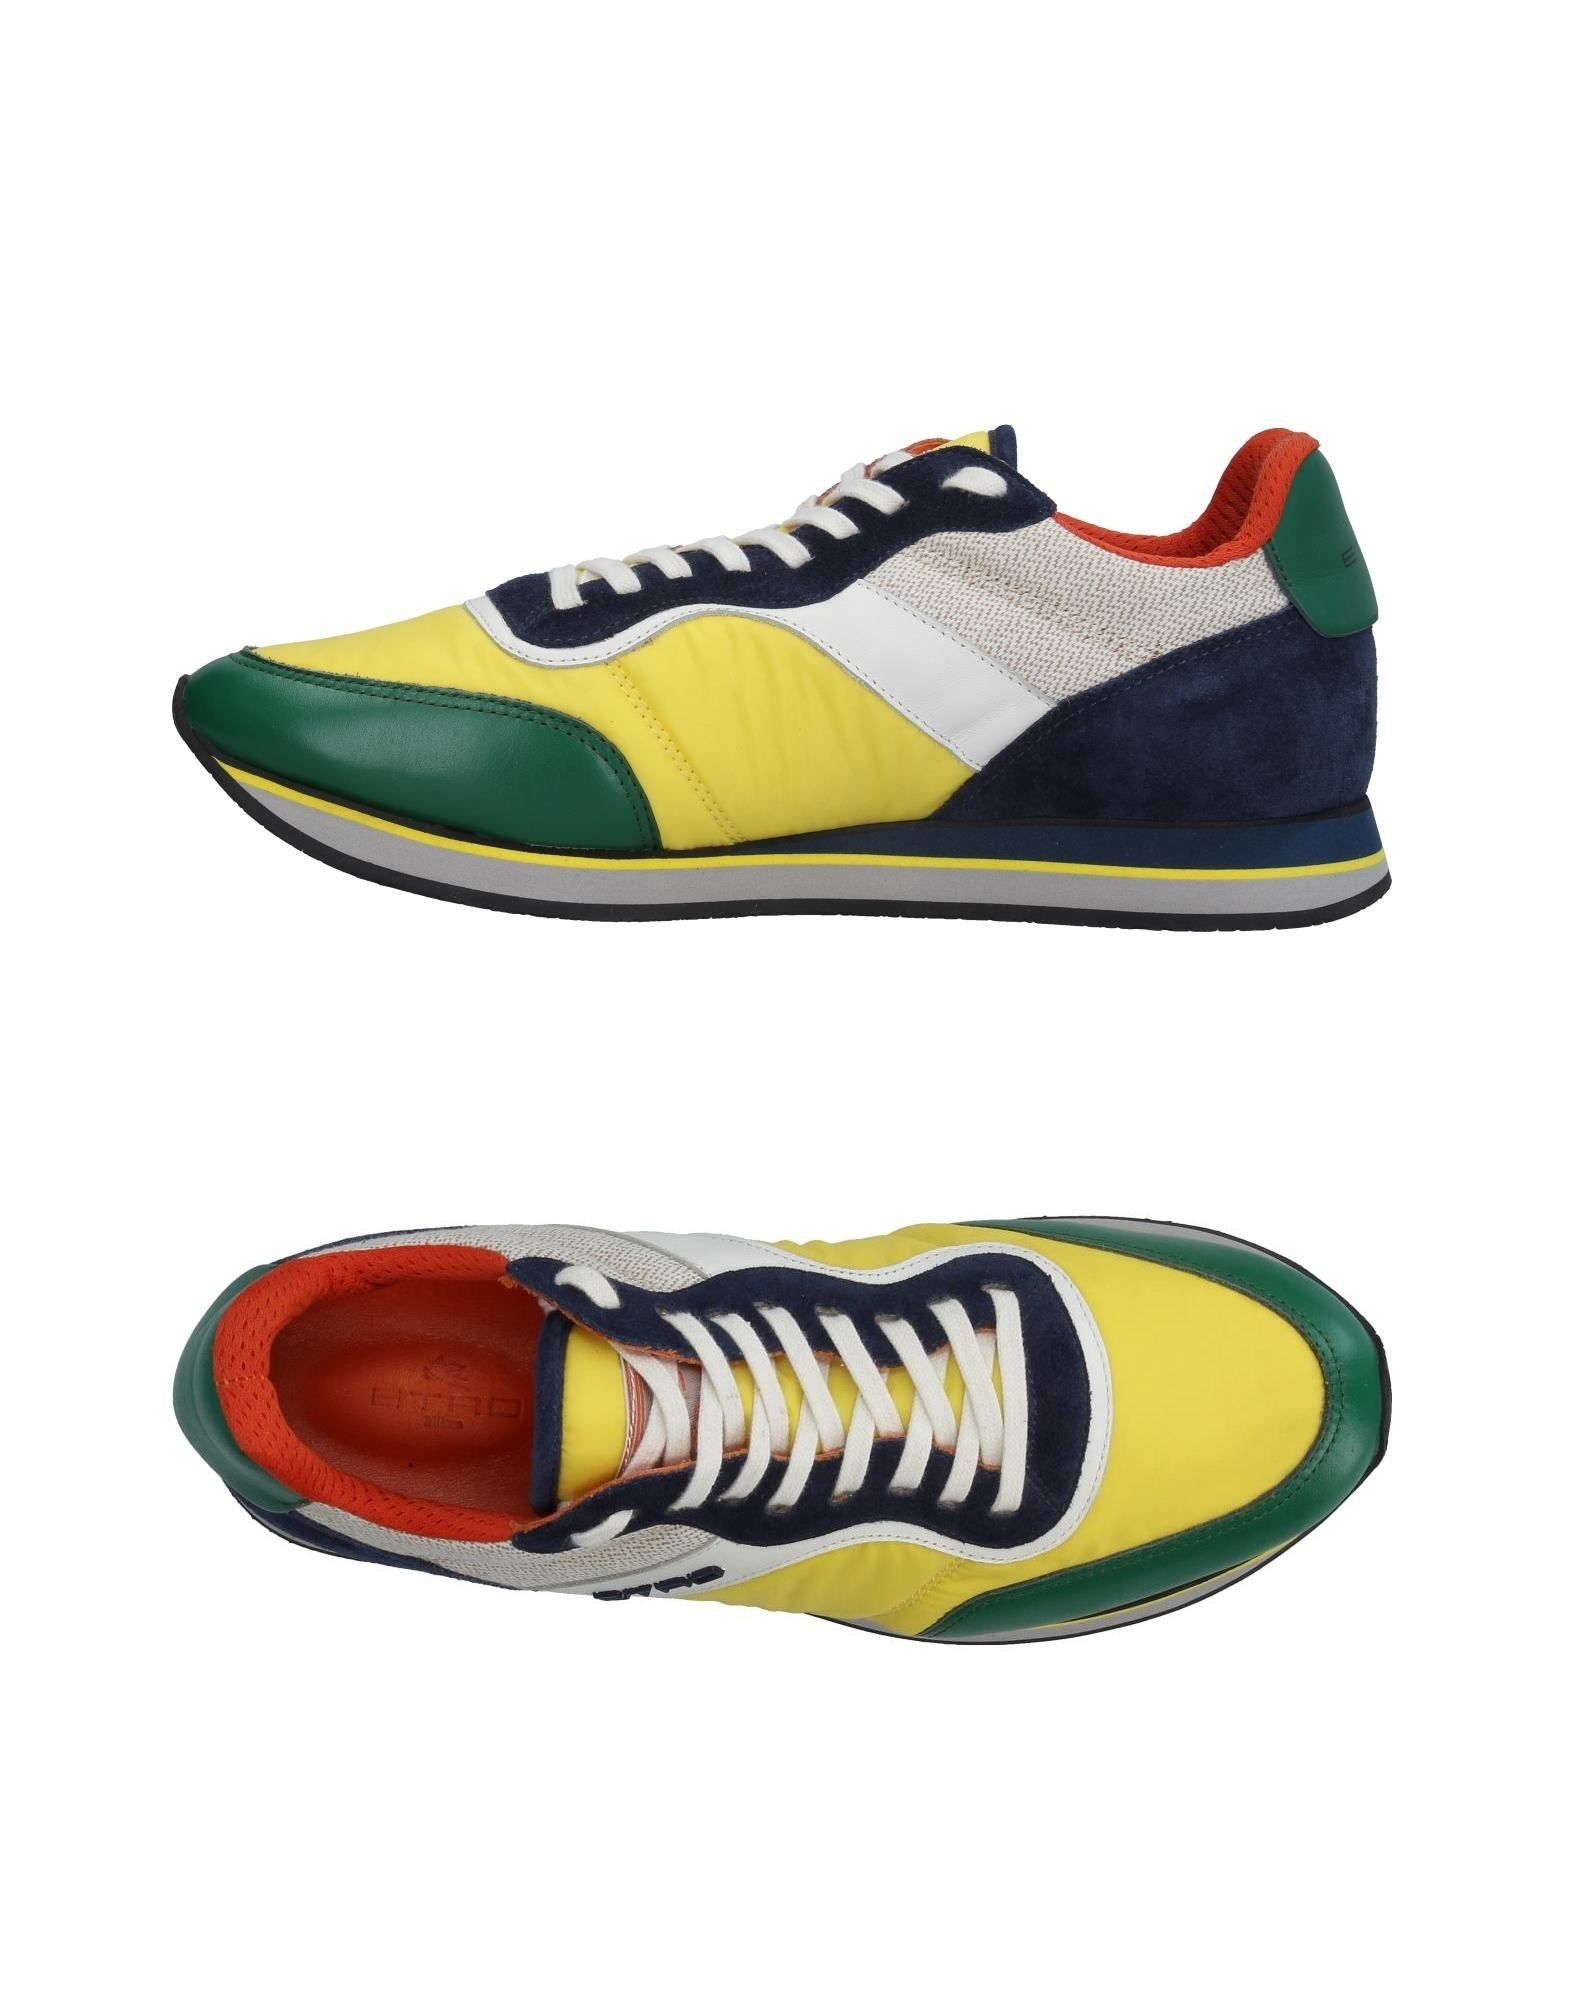 ETRO Herren Low Sneakers & Tennisschuhe Farbe Gelb Größe 9